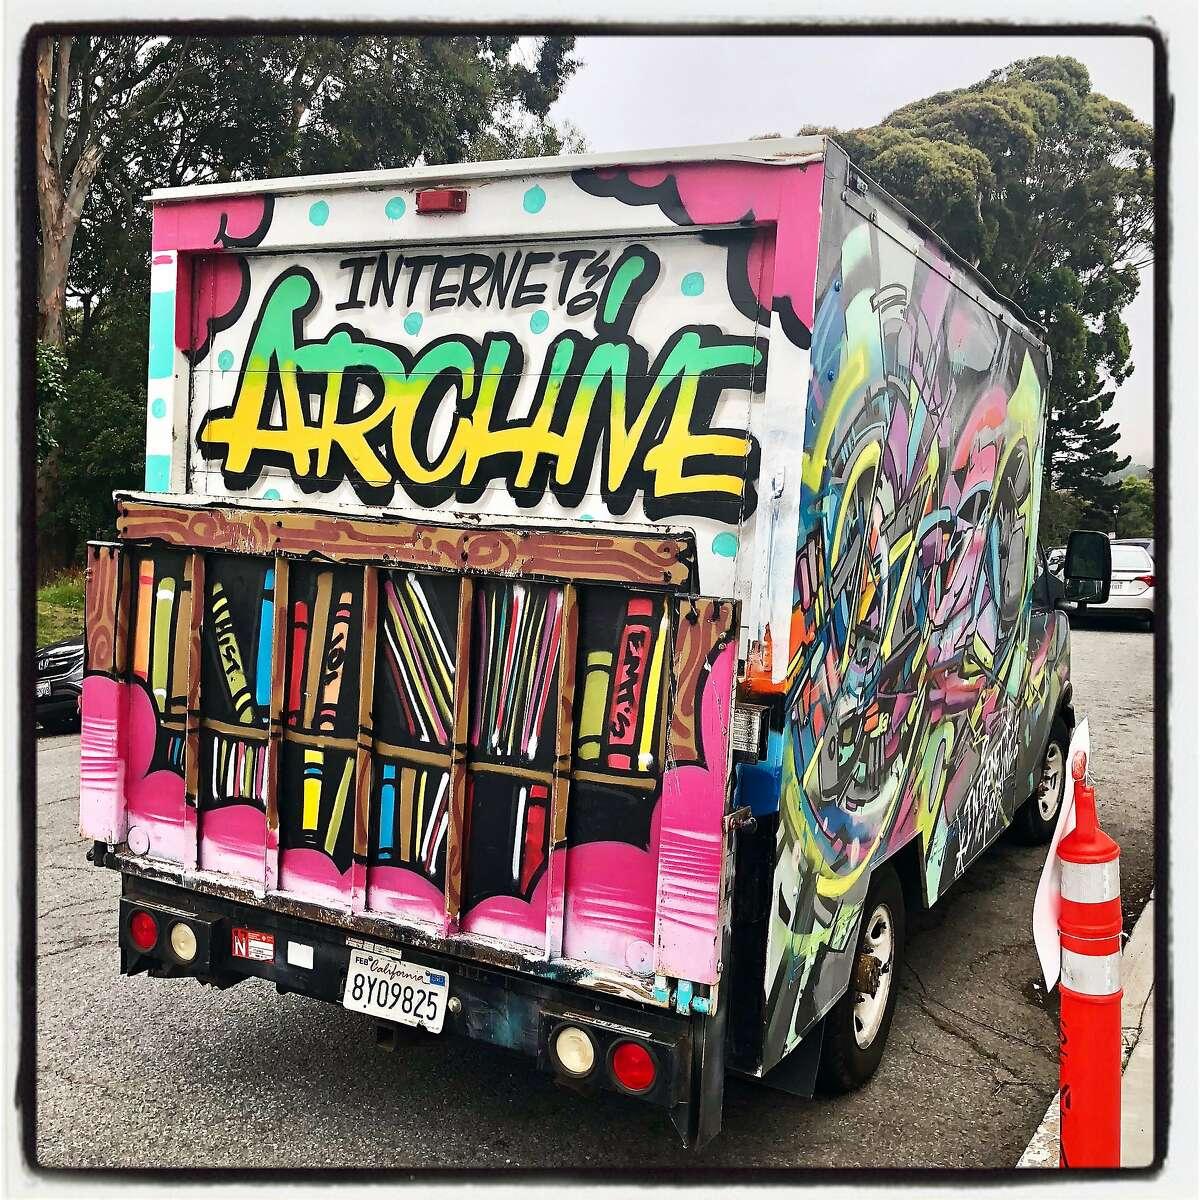 The Internet Archive's bookmobile van. Oct. 3, 2018.